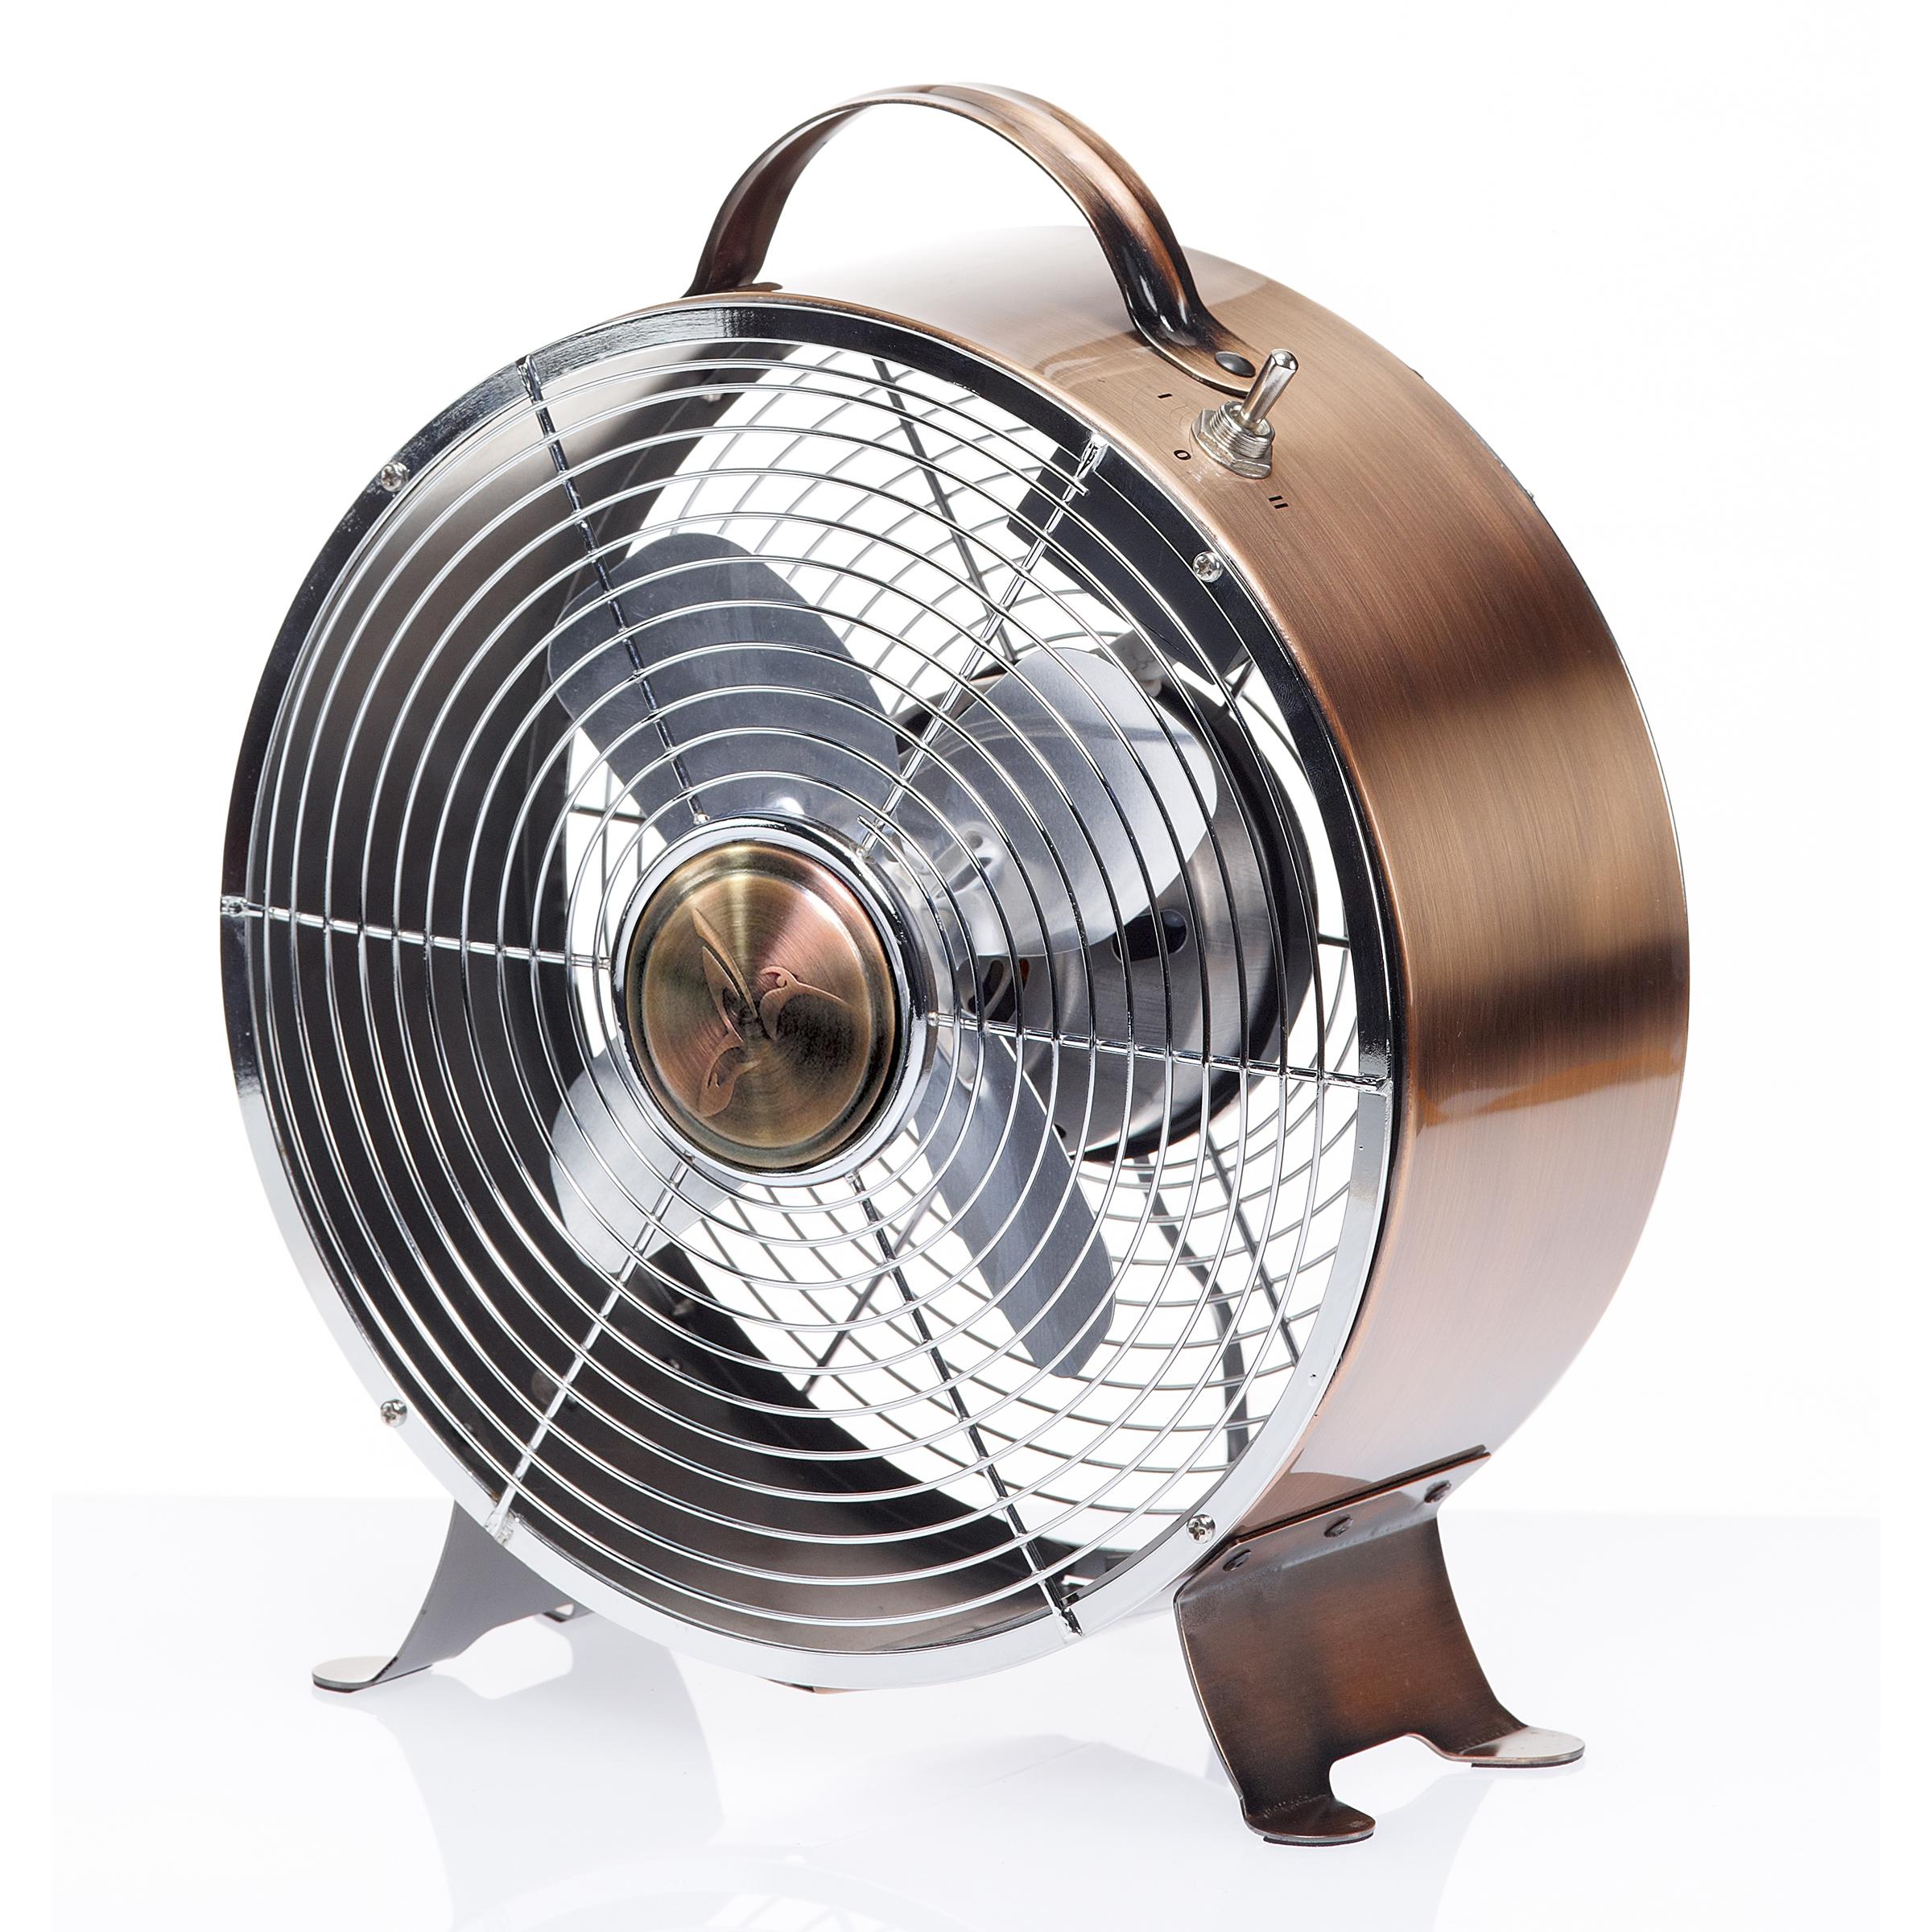 DecoBREEZE Retro Table Fan Air Circulator Fan, Brushed Copper